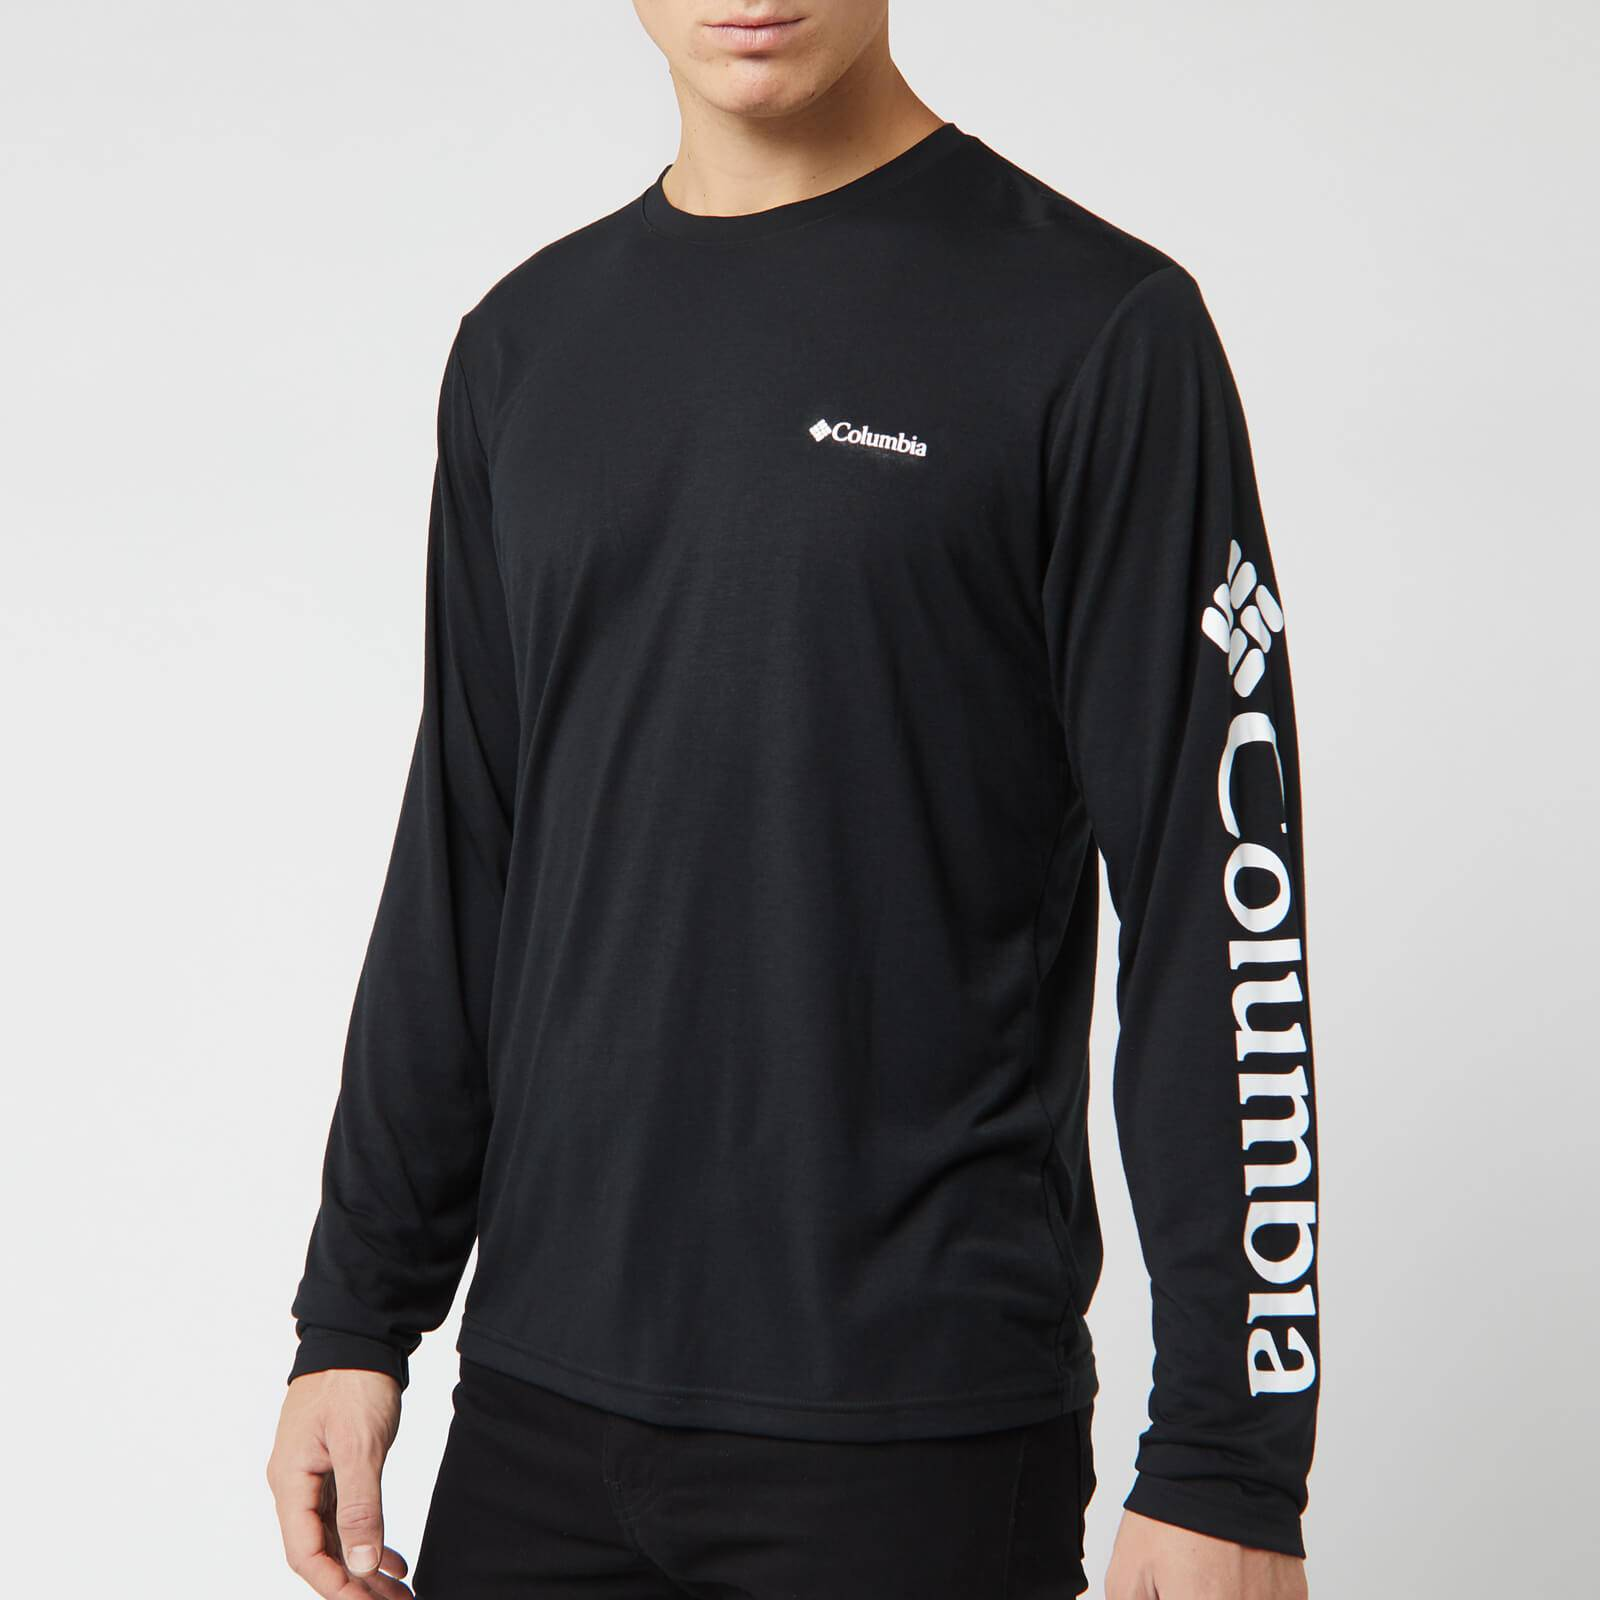 Columbia Men's Miller Valley Long Sleeve Graphic T-Shirt - Black/White - M